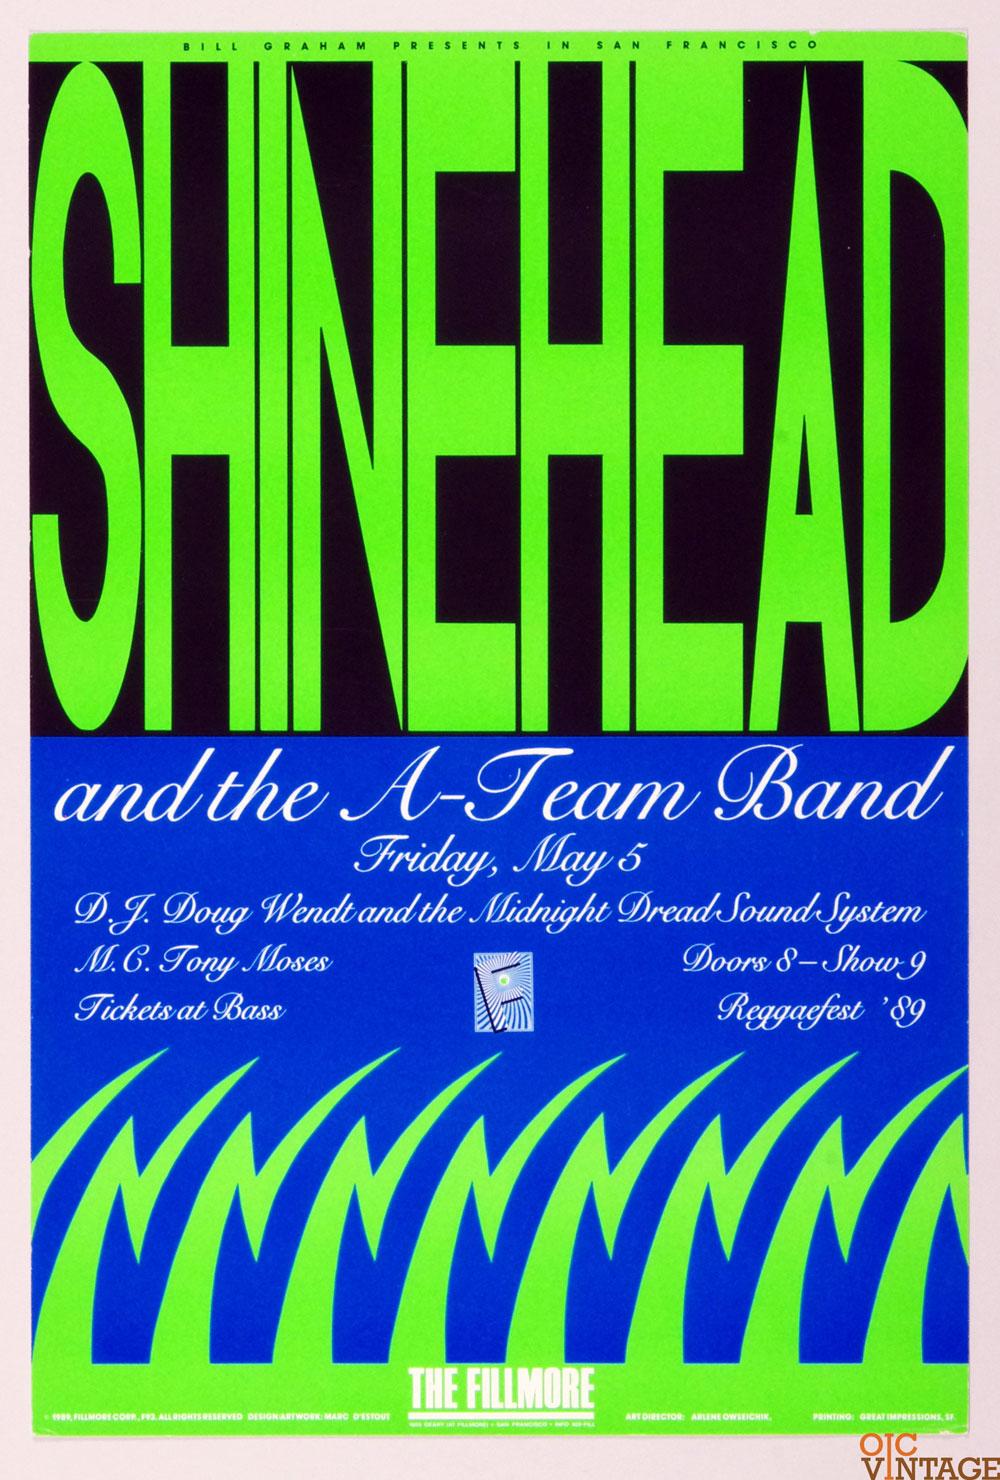 Shinehead and the A-Team Band Poster 1989 May 5 New Fillmore